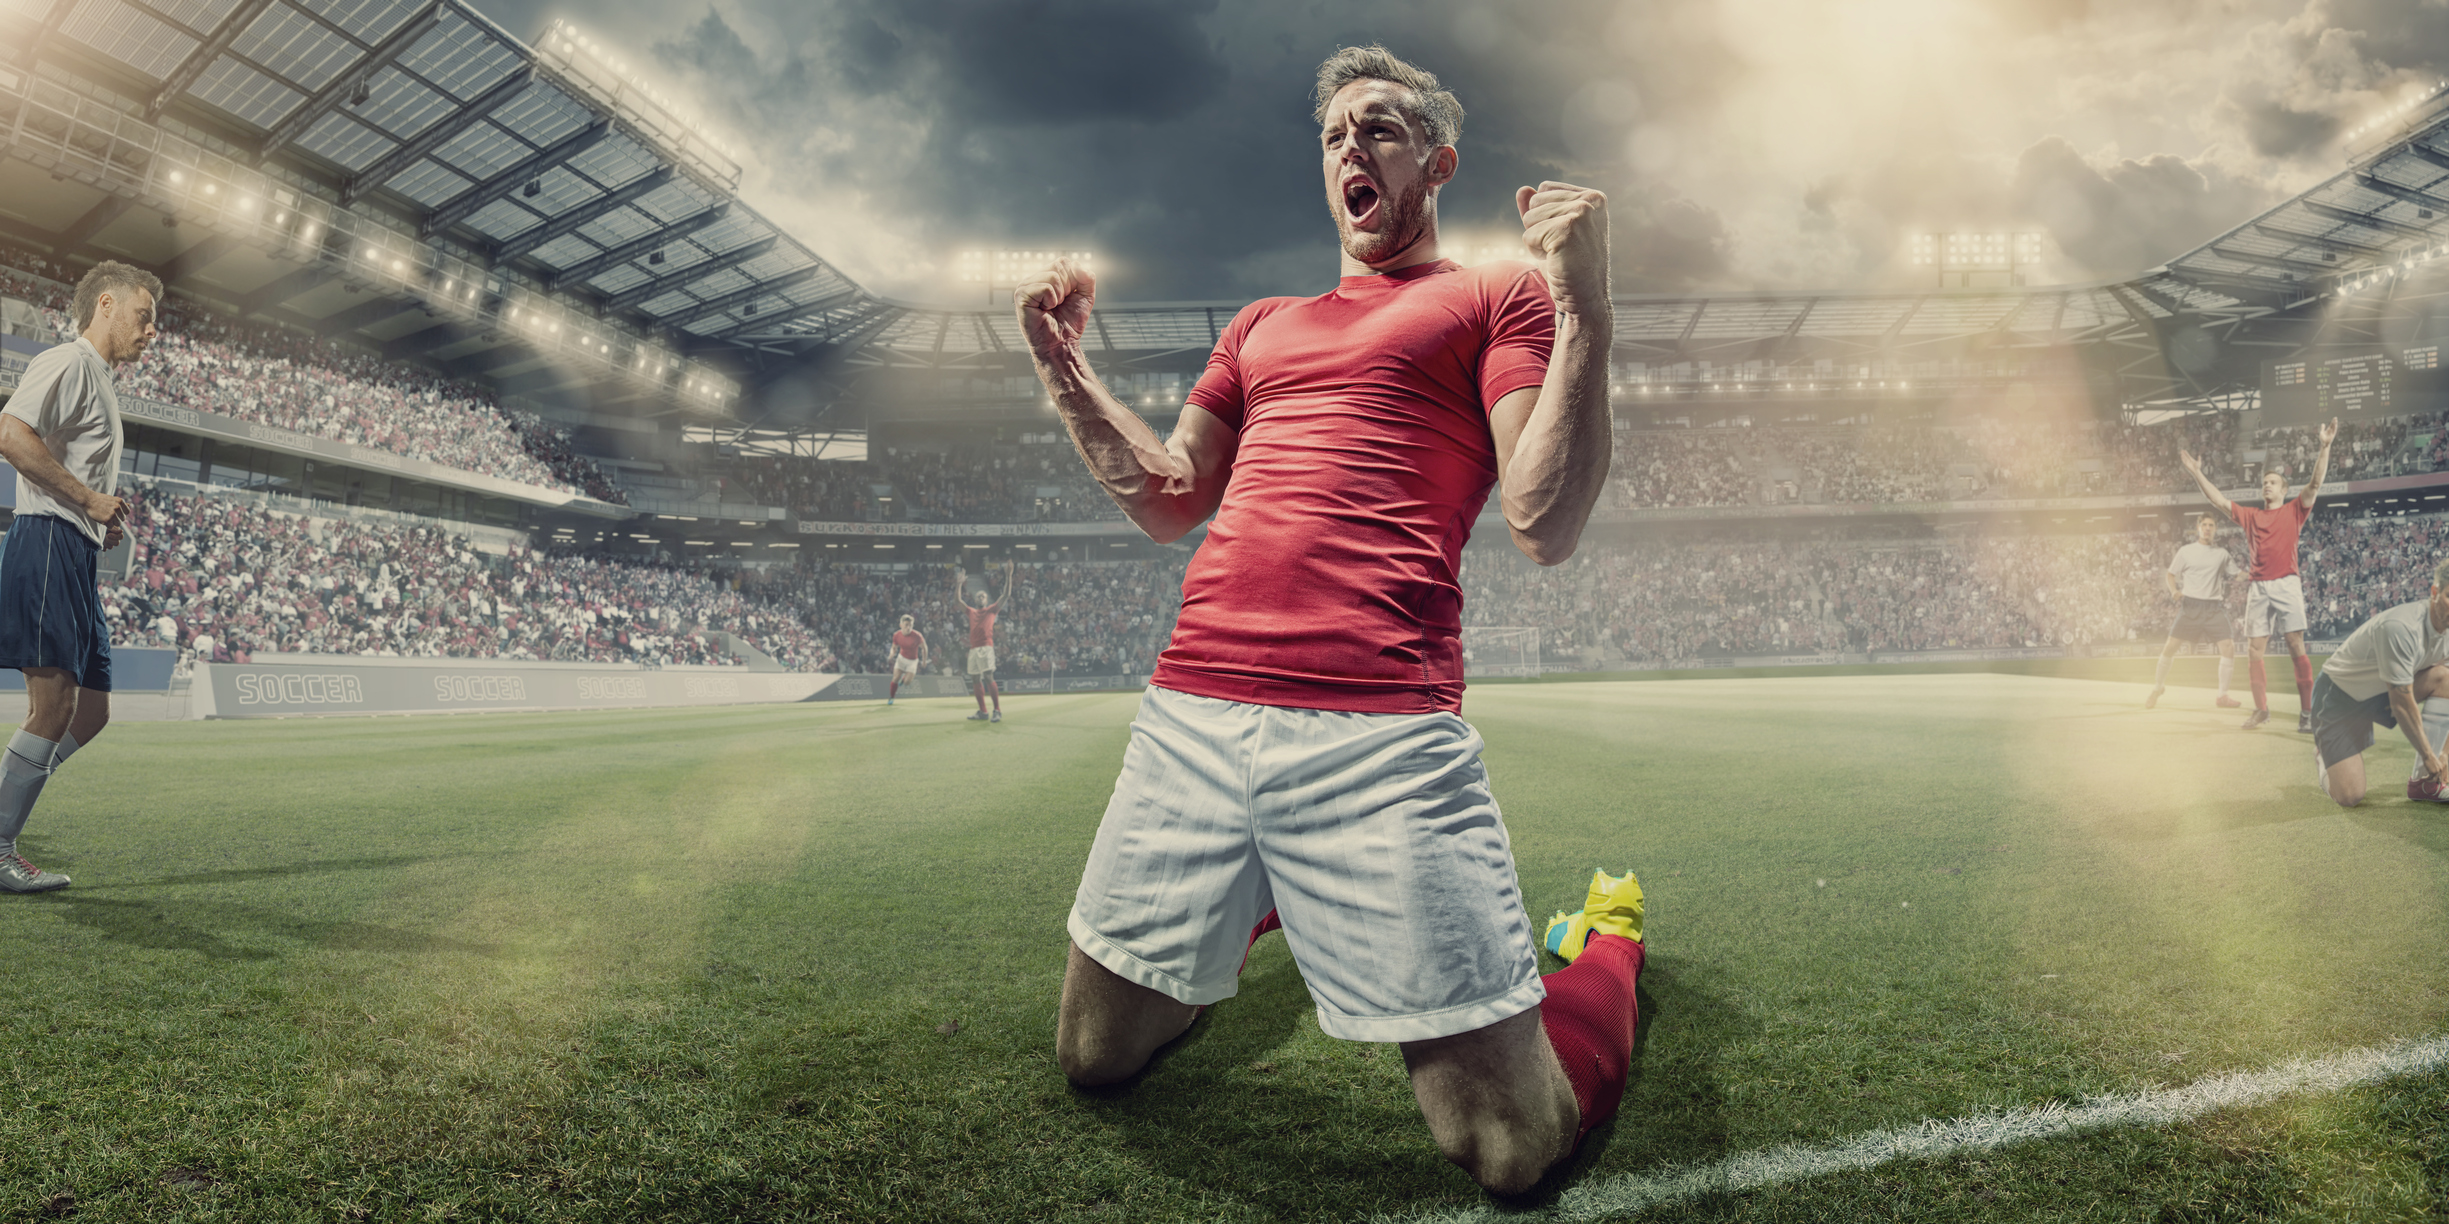 Fotbollens moderna historia